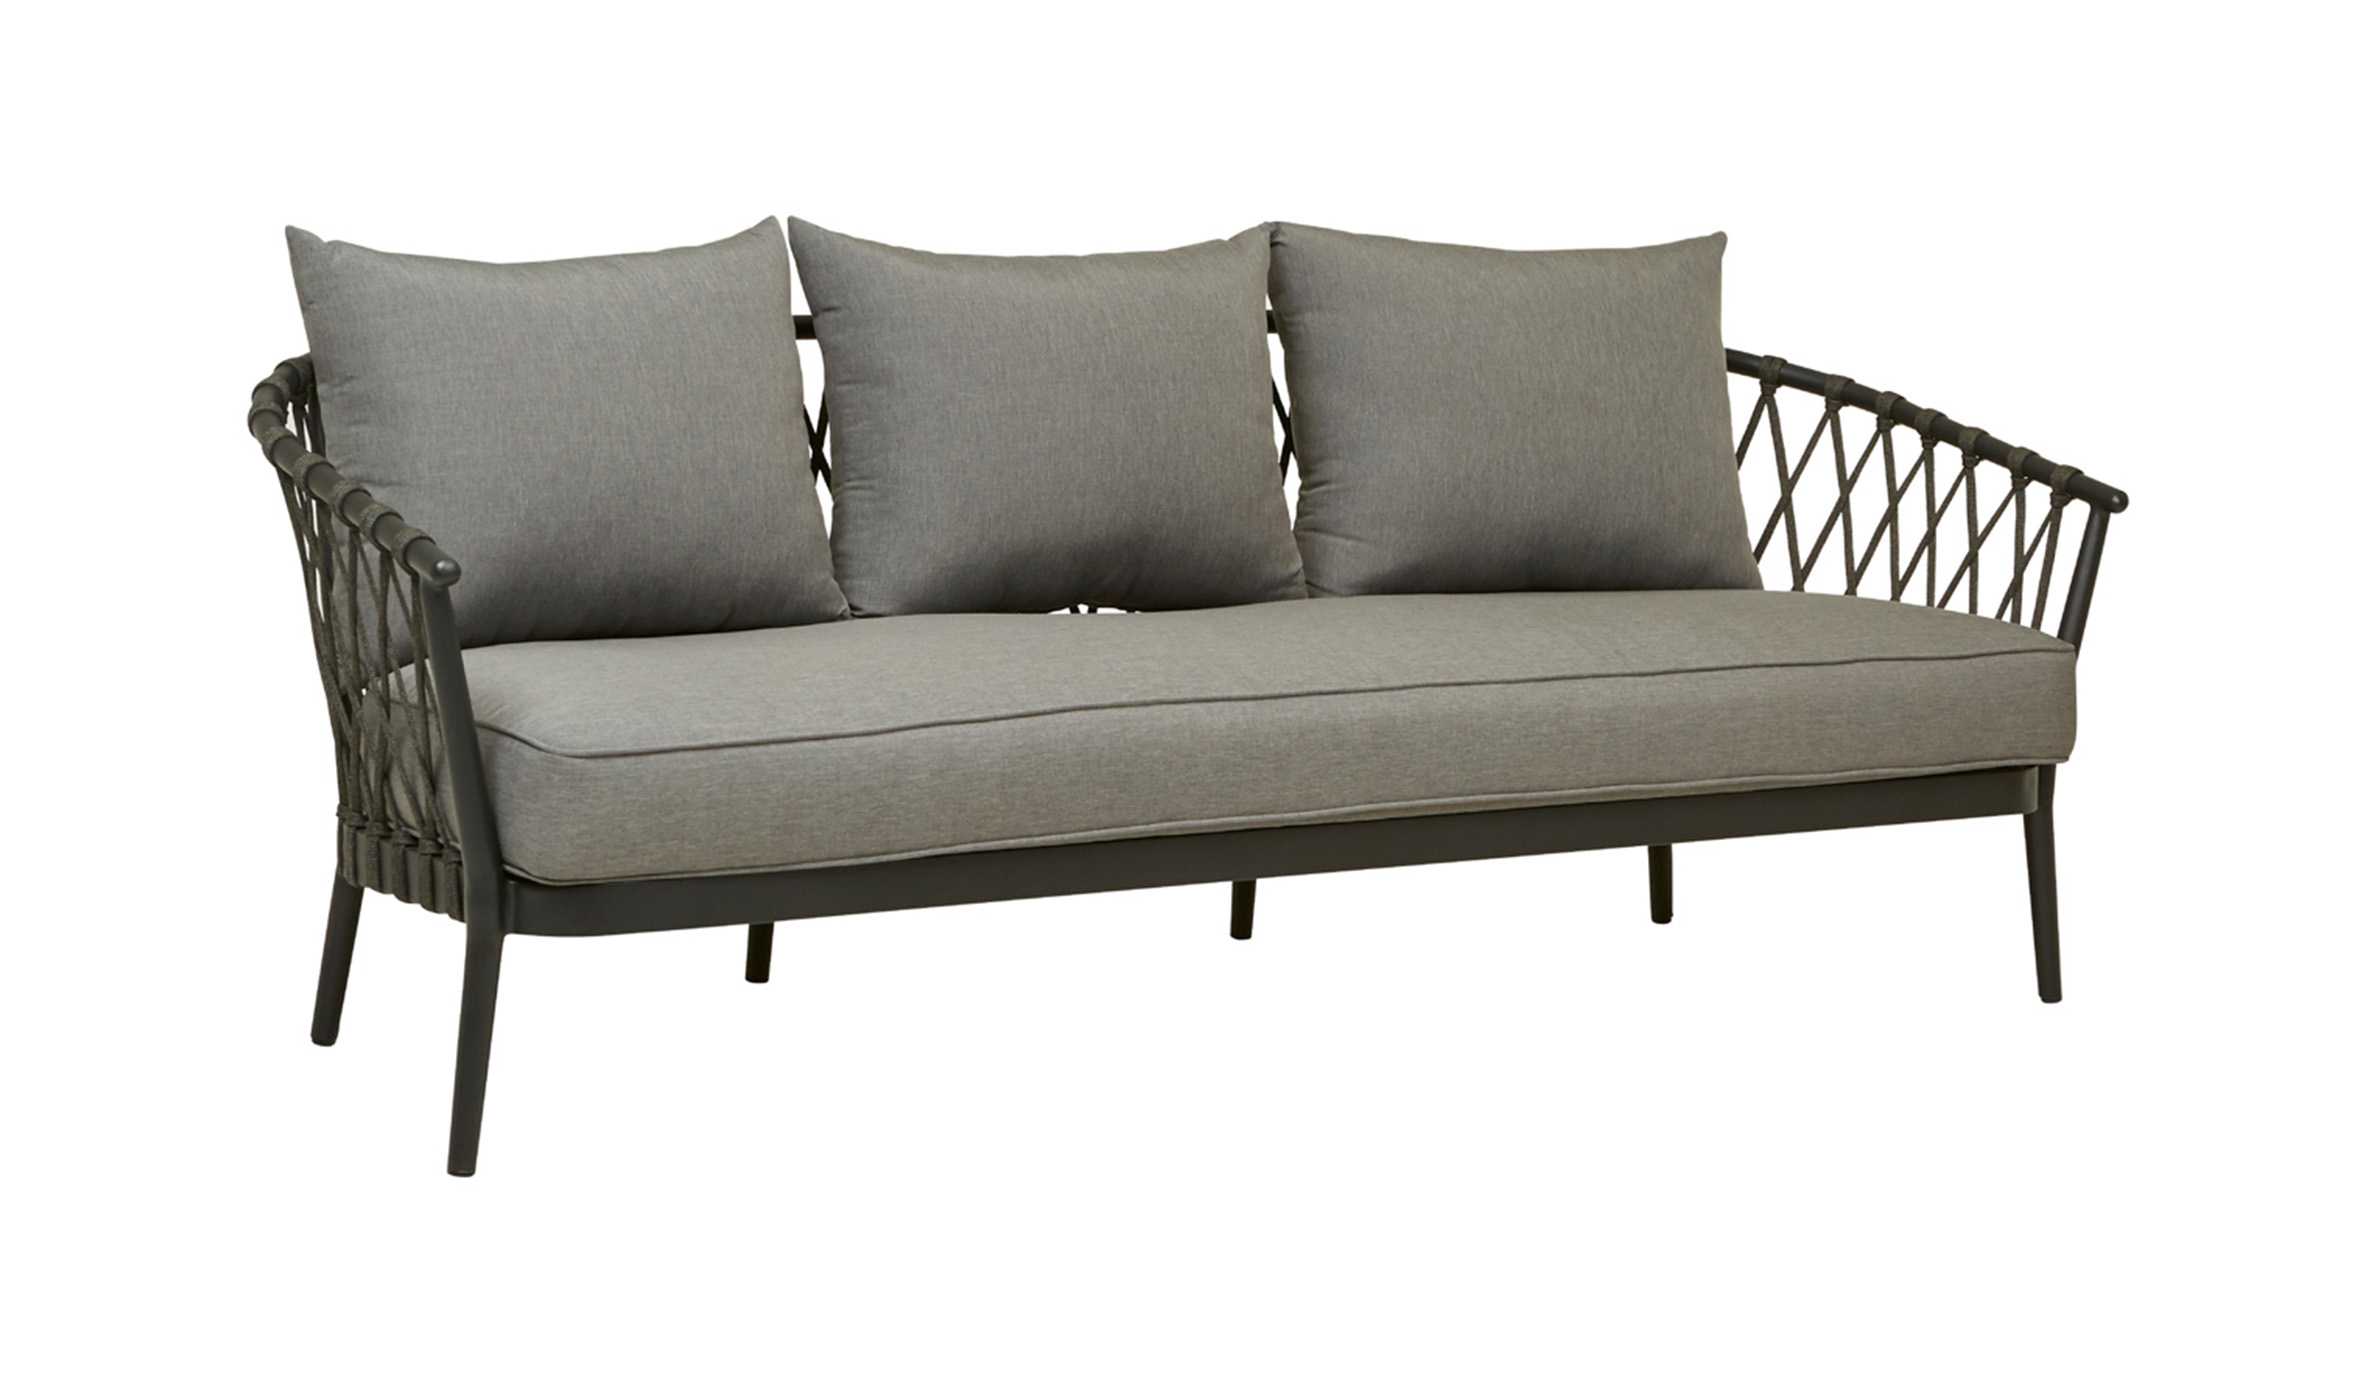 Furniture Thumbnails outdoor-sofas-maui-three